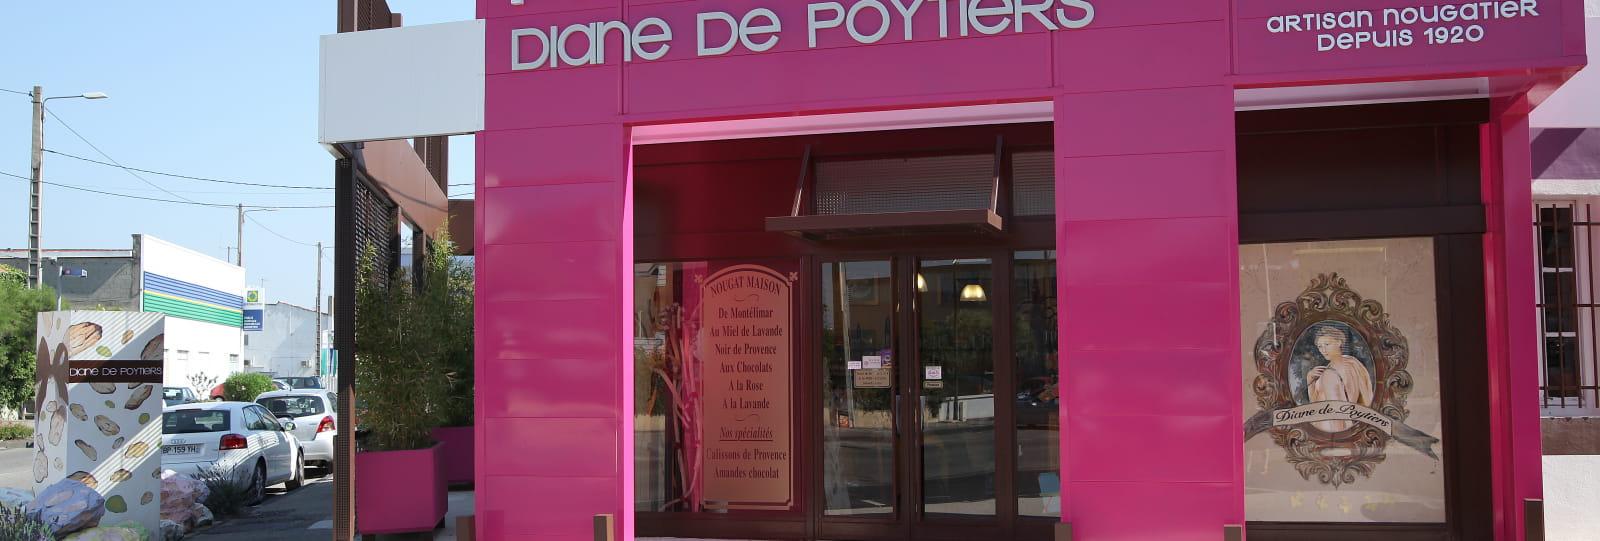 Nougat Diane de Poytiers